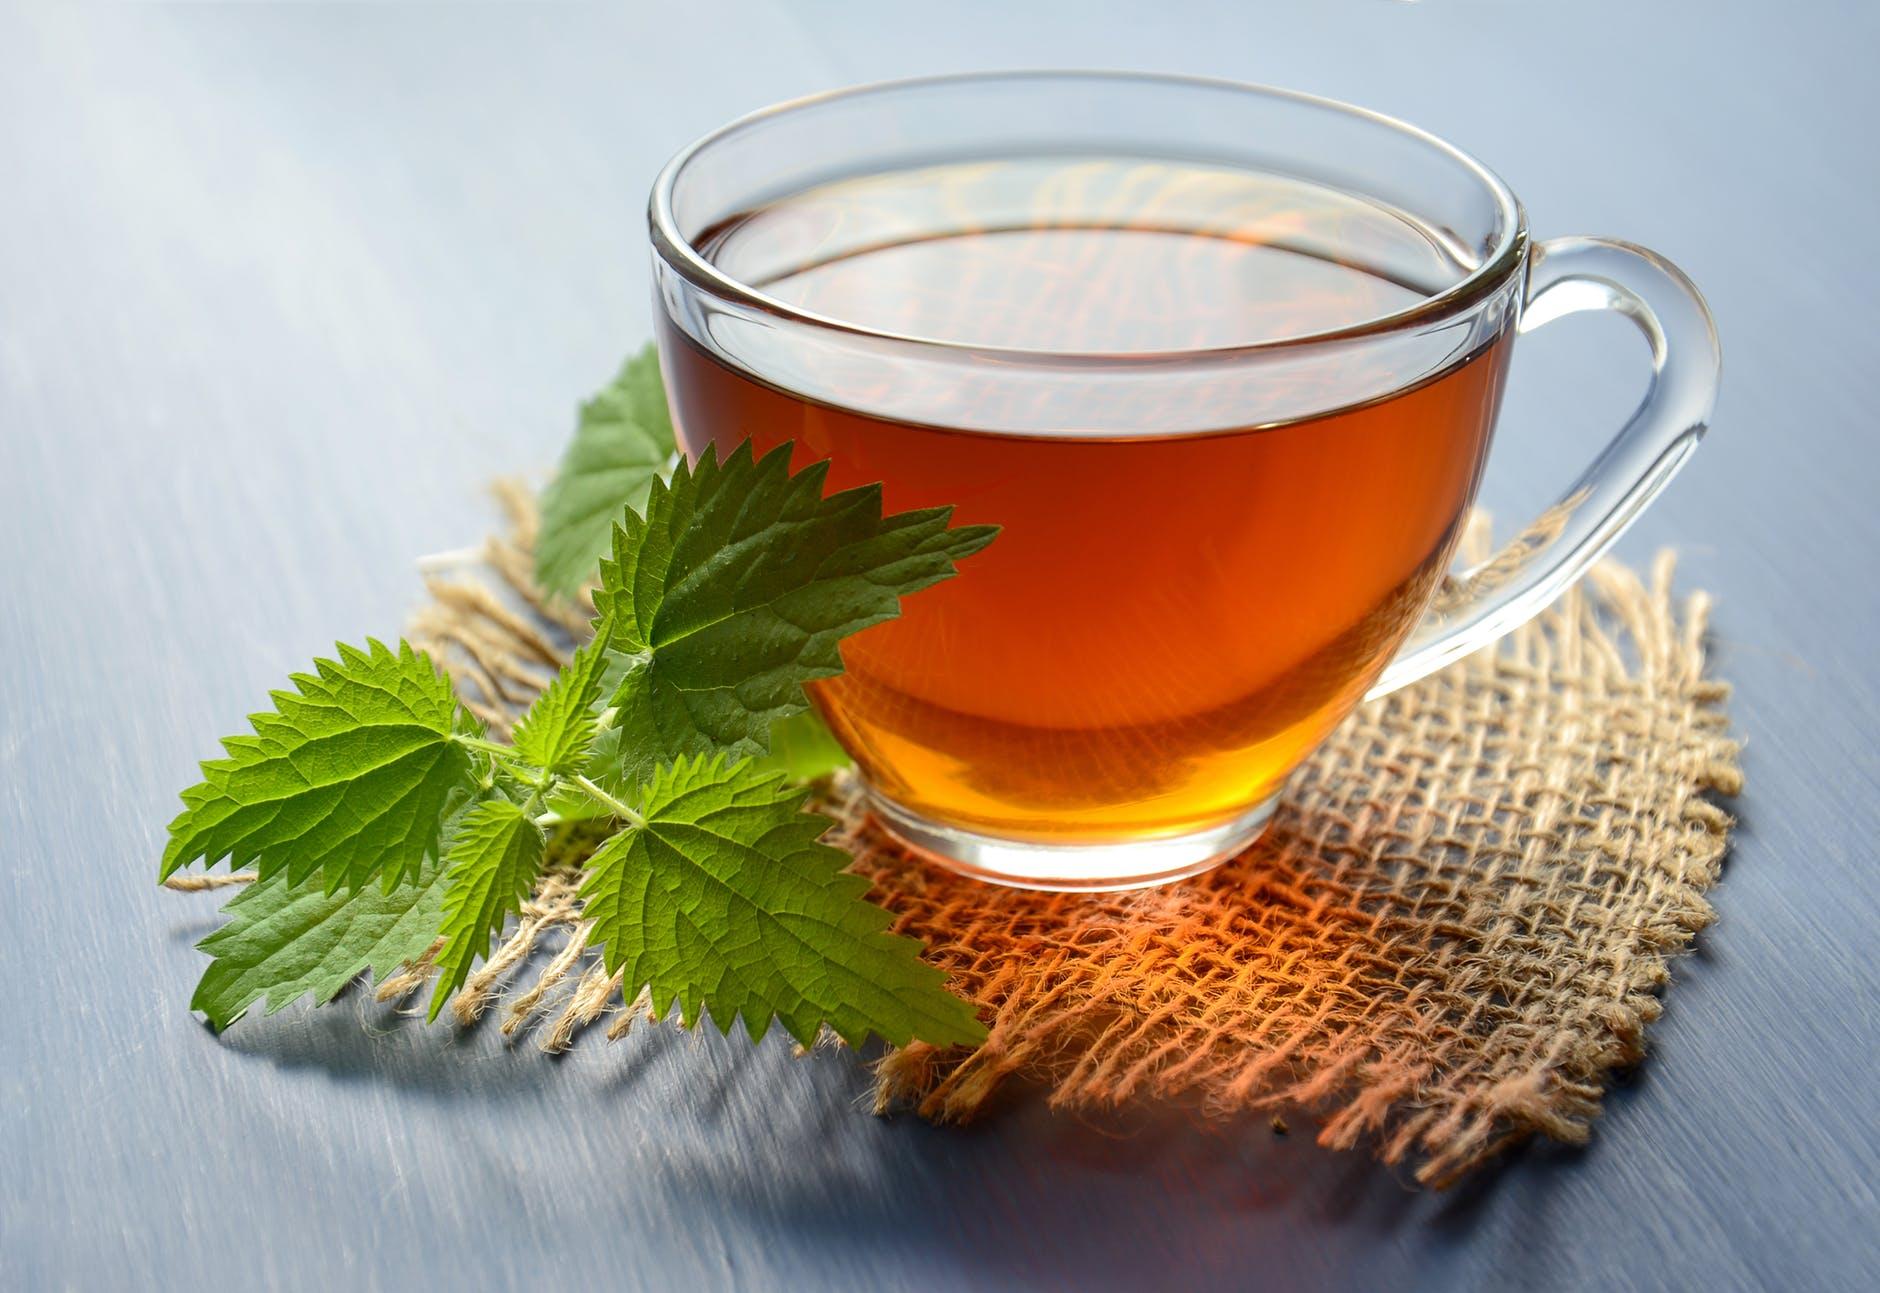 Green Tea as Immune Booster Food